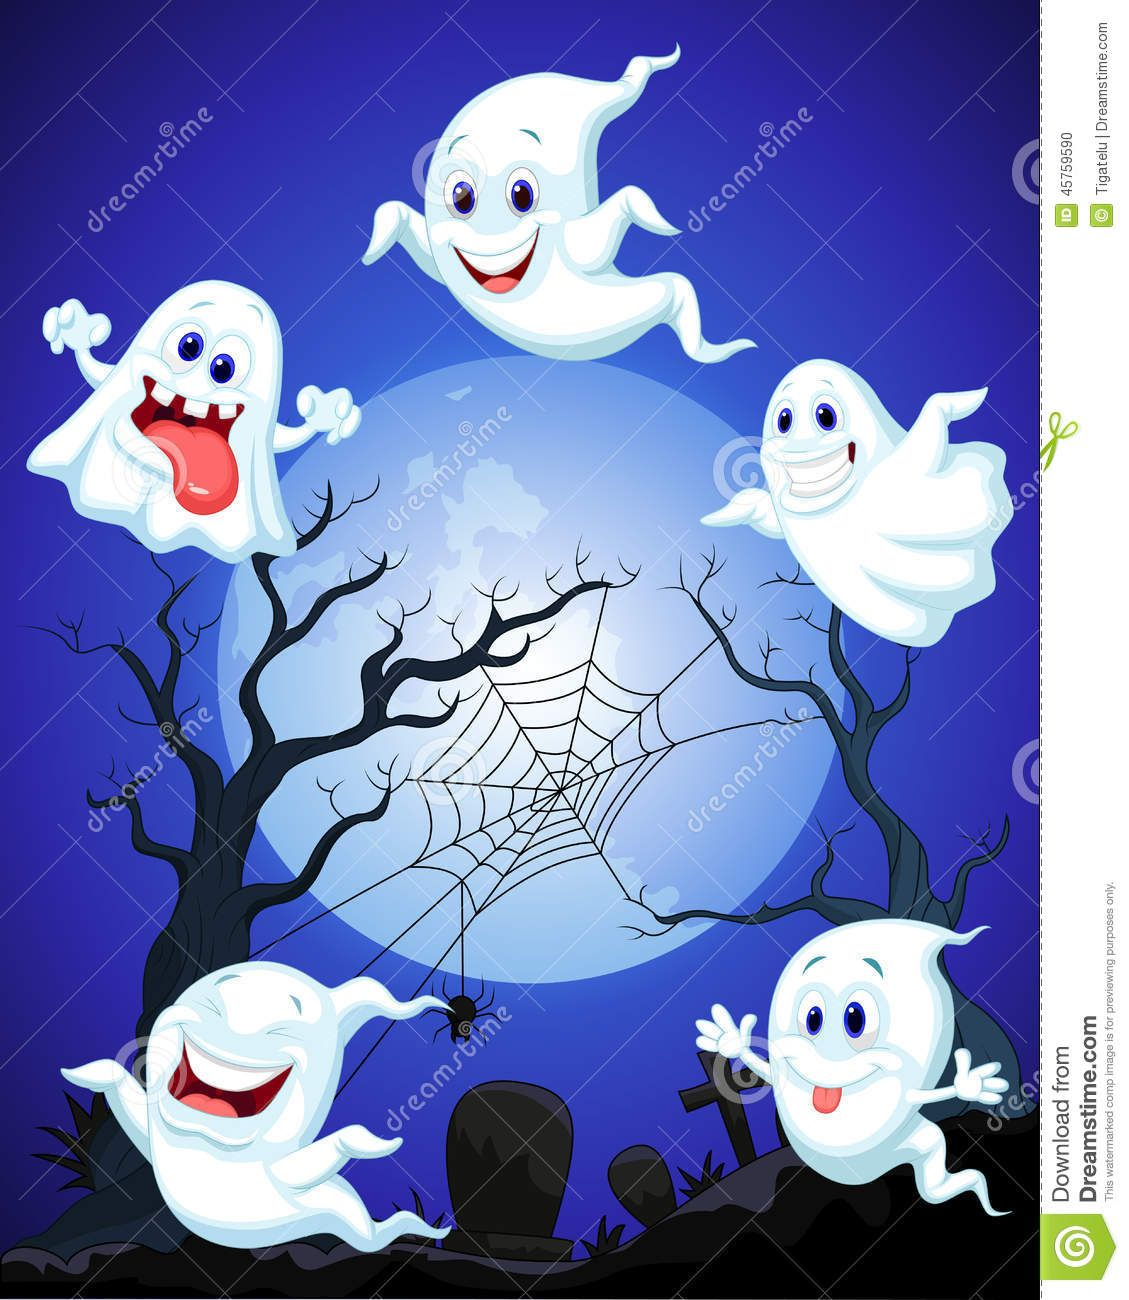 Halloween Cartoon Illustration Of Halloween Ghost Cartoon Fun Halloween Decor Ghost Cartoon Halloween Frames